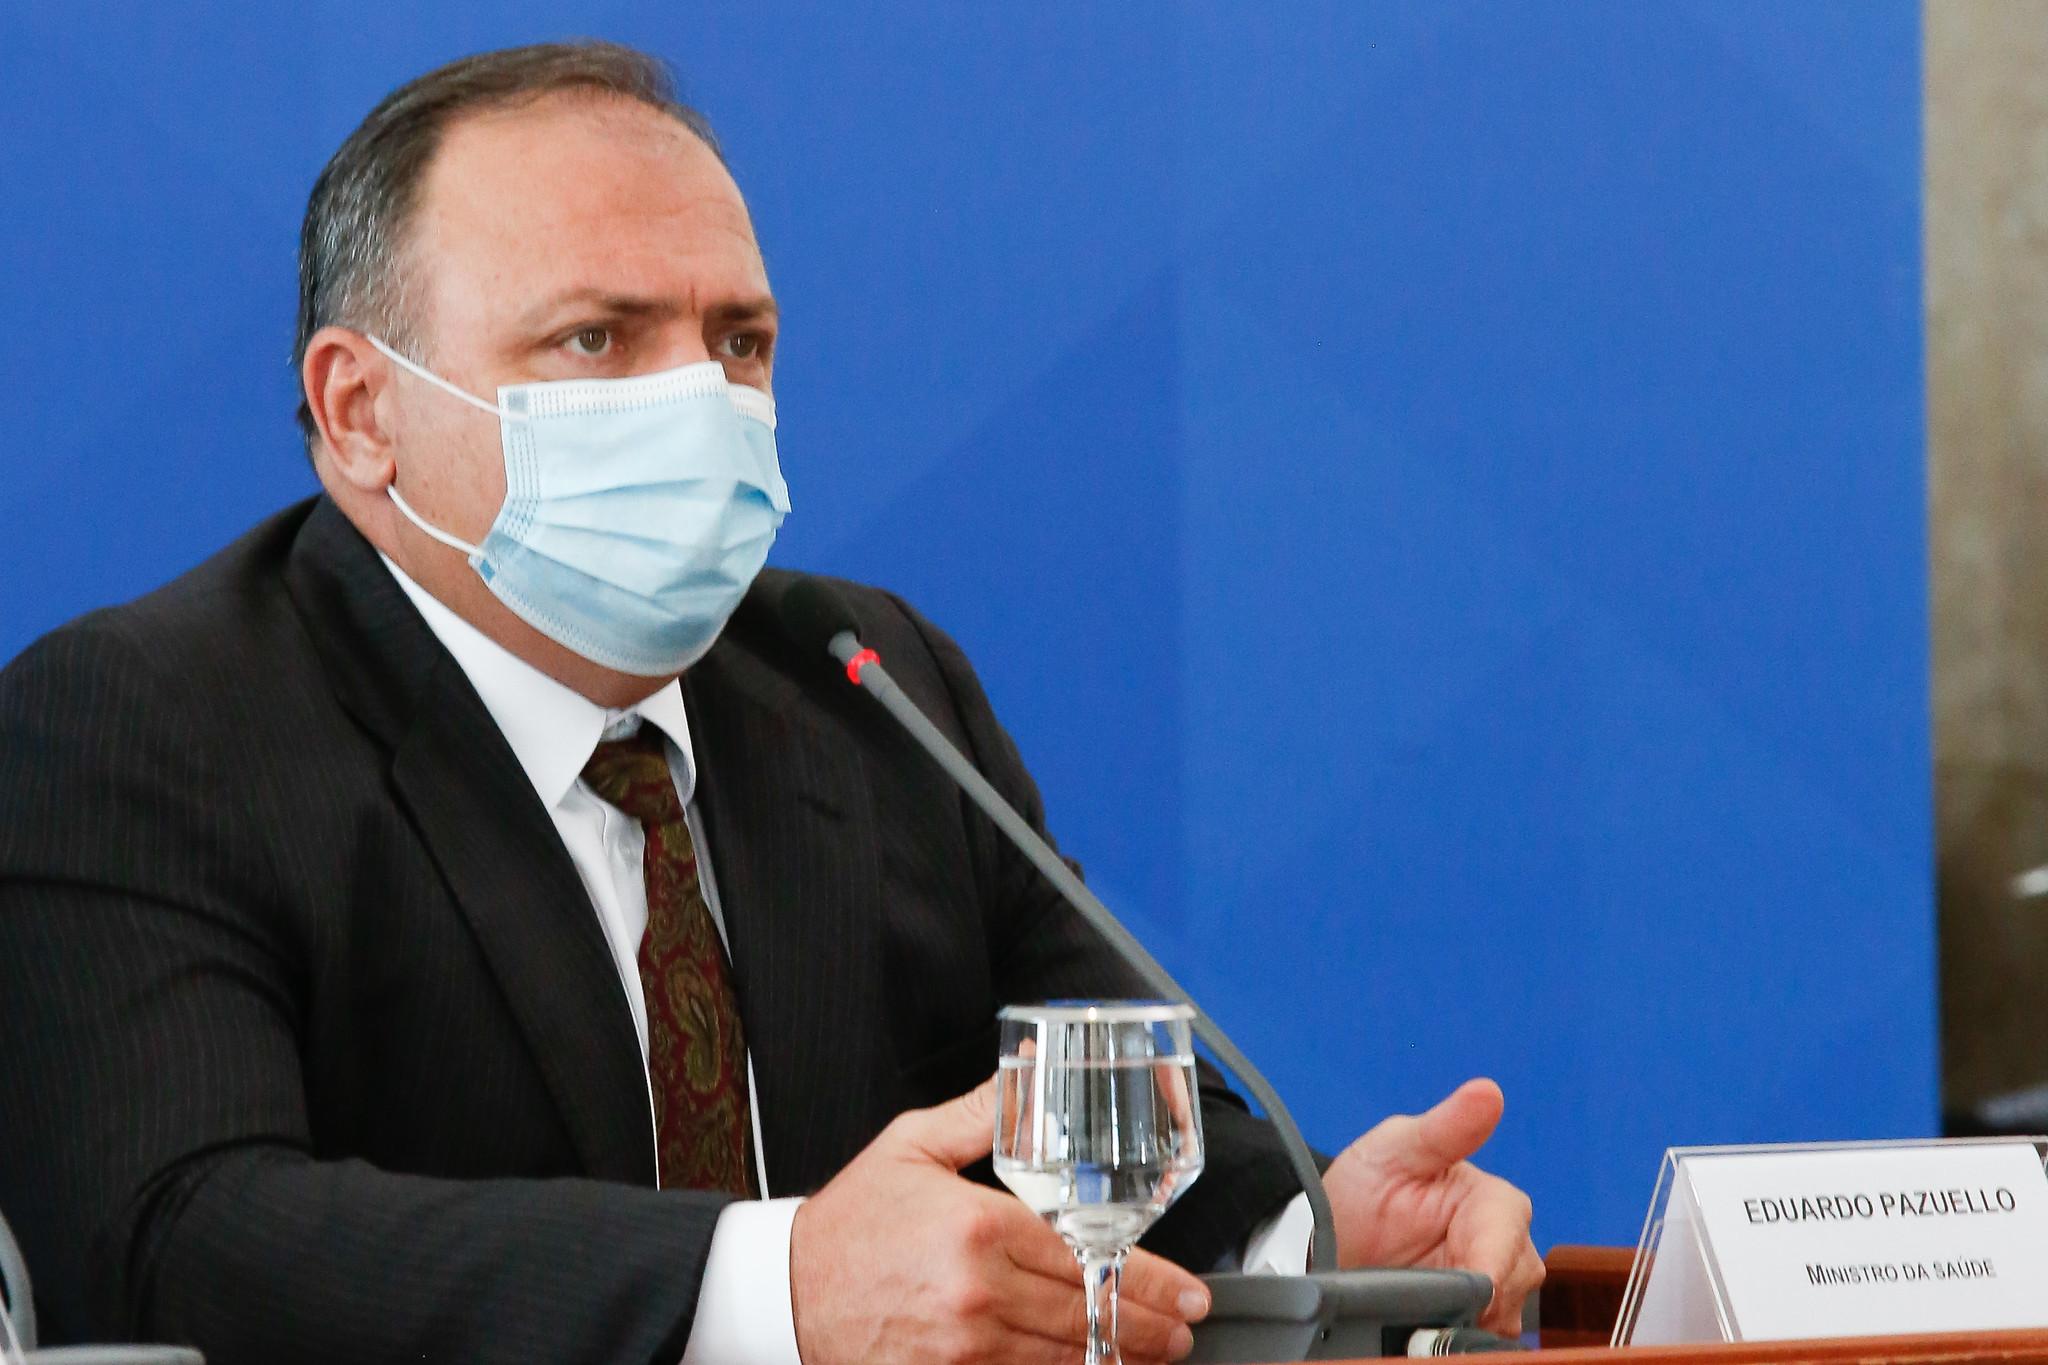 O ministro da Saúde Eduardo Pazuello durante entrevista coletiva